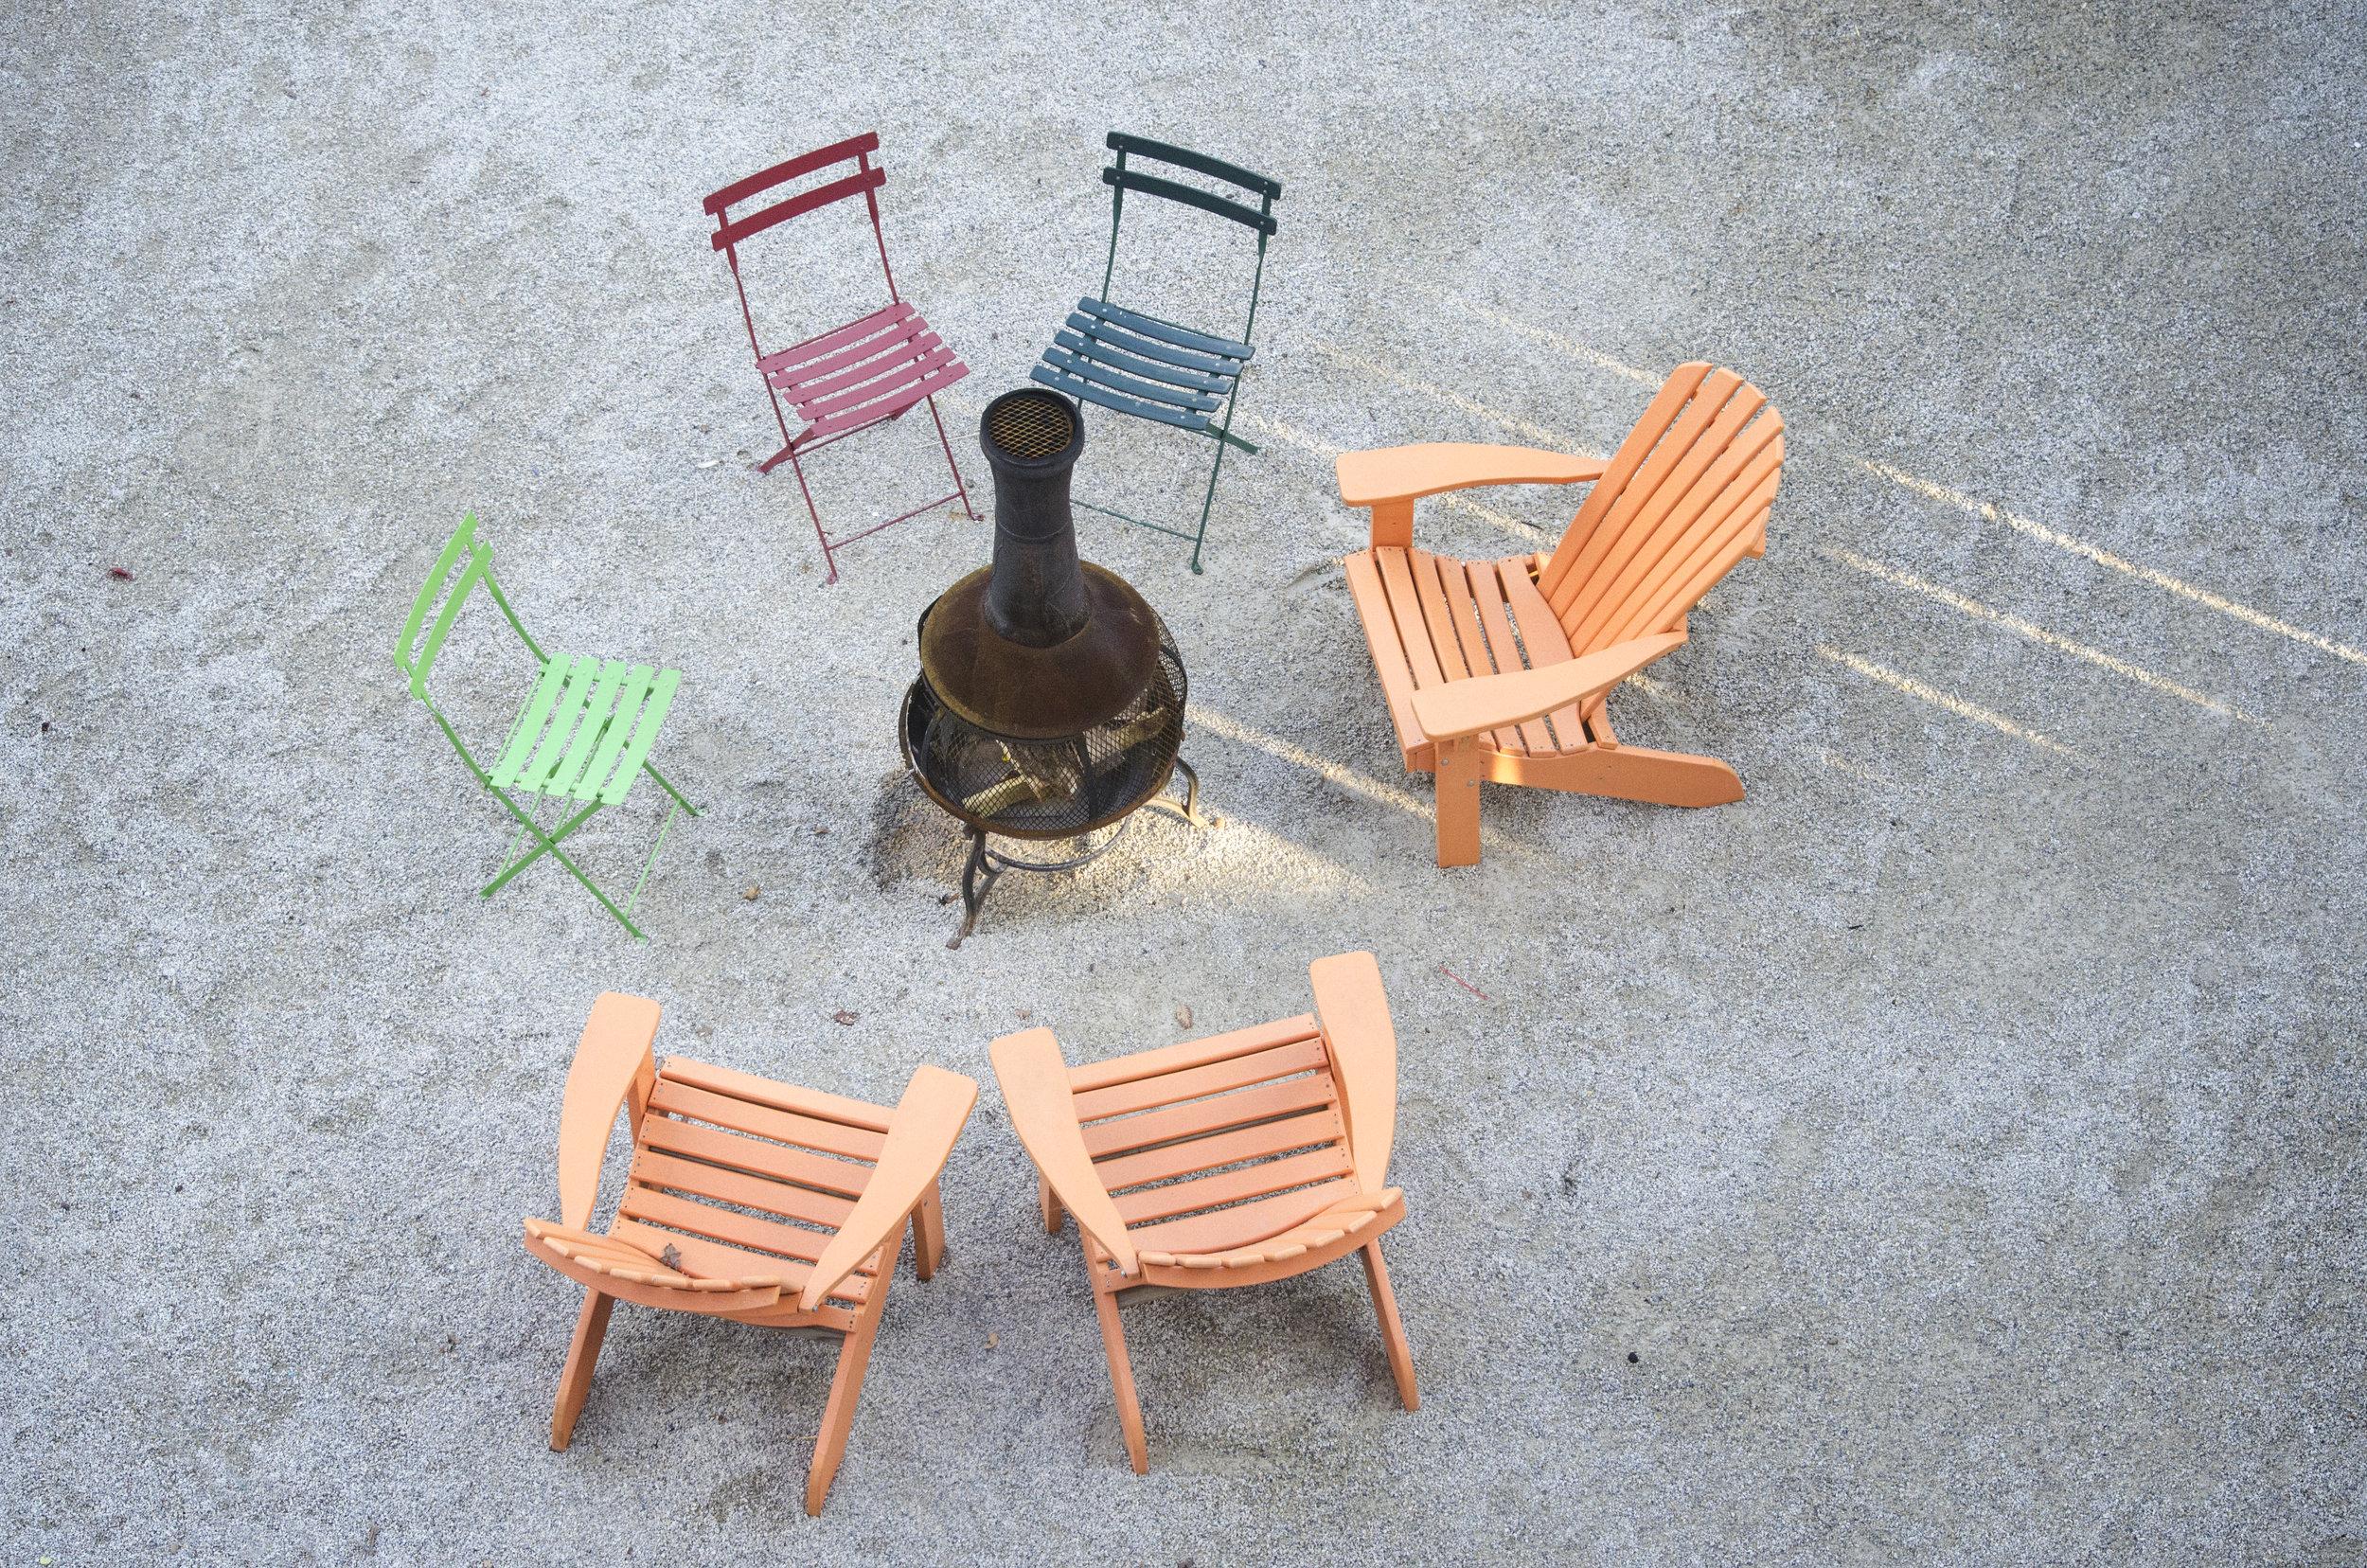 minimal-chairs_31294612690_o.jpg